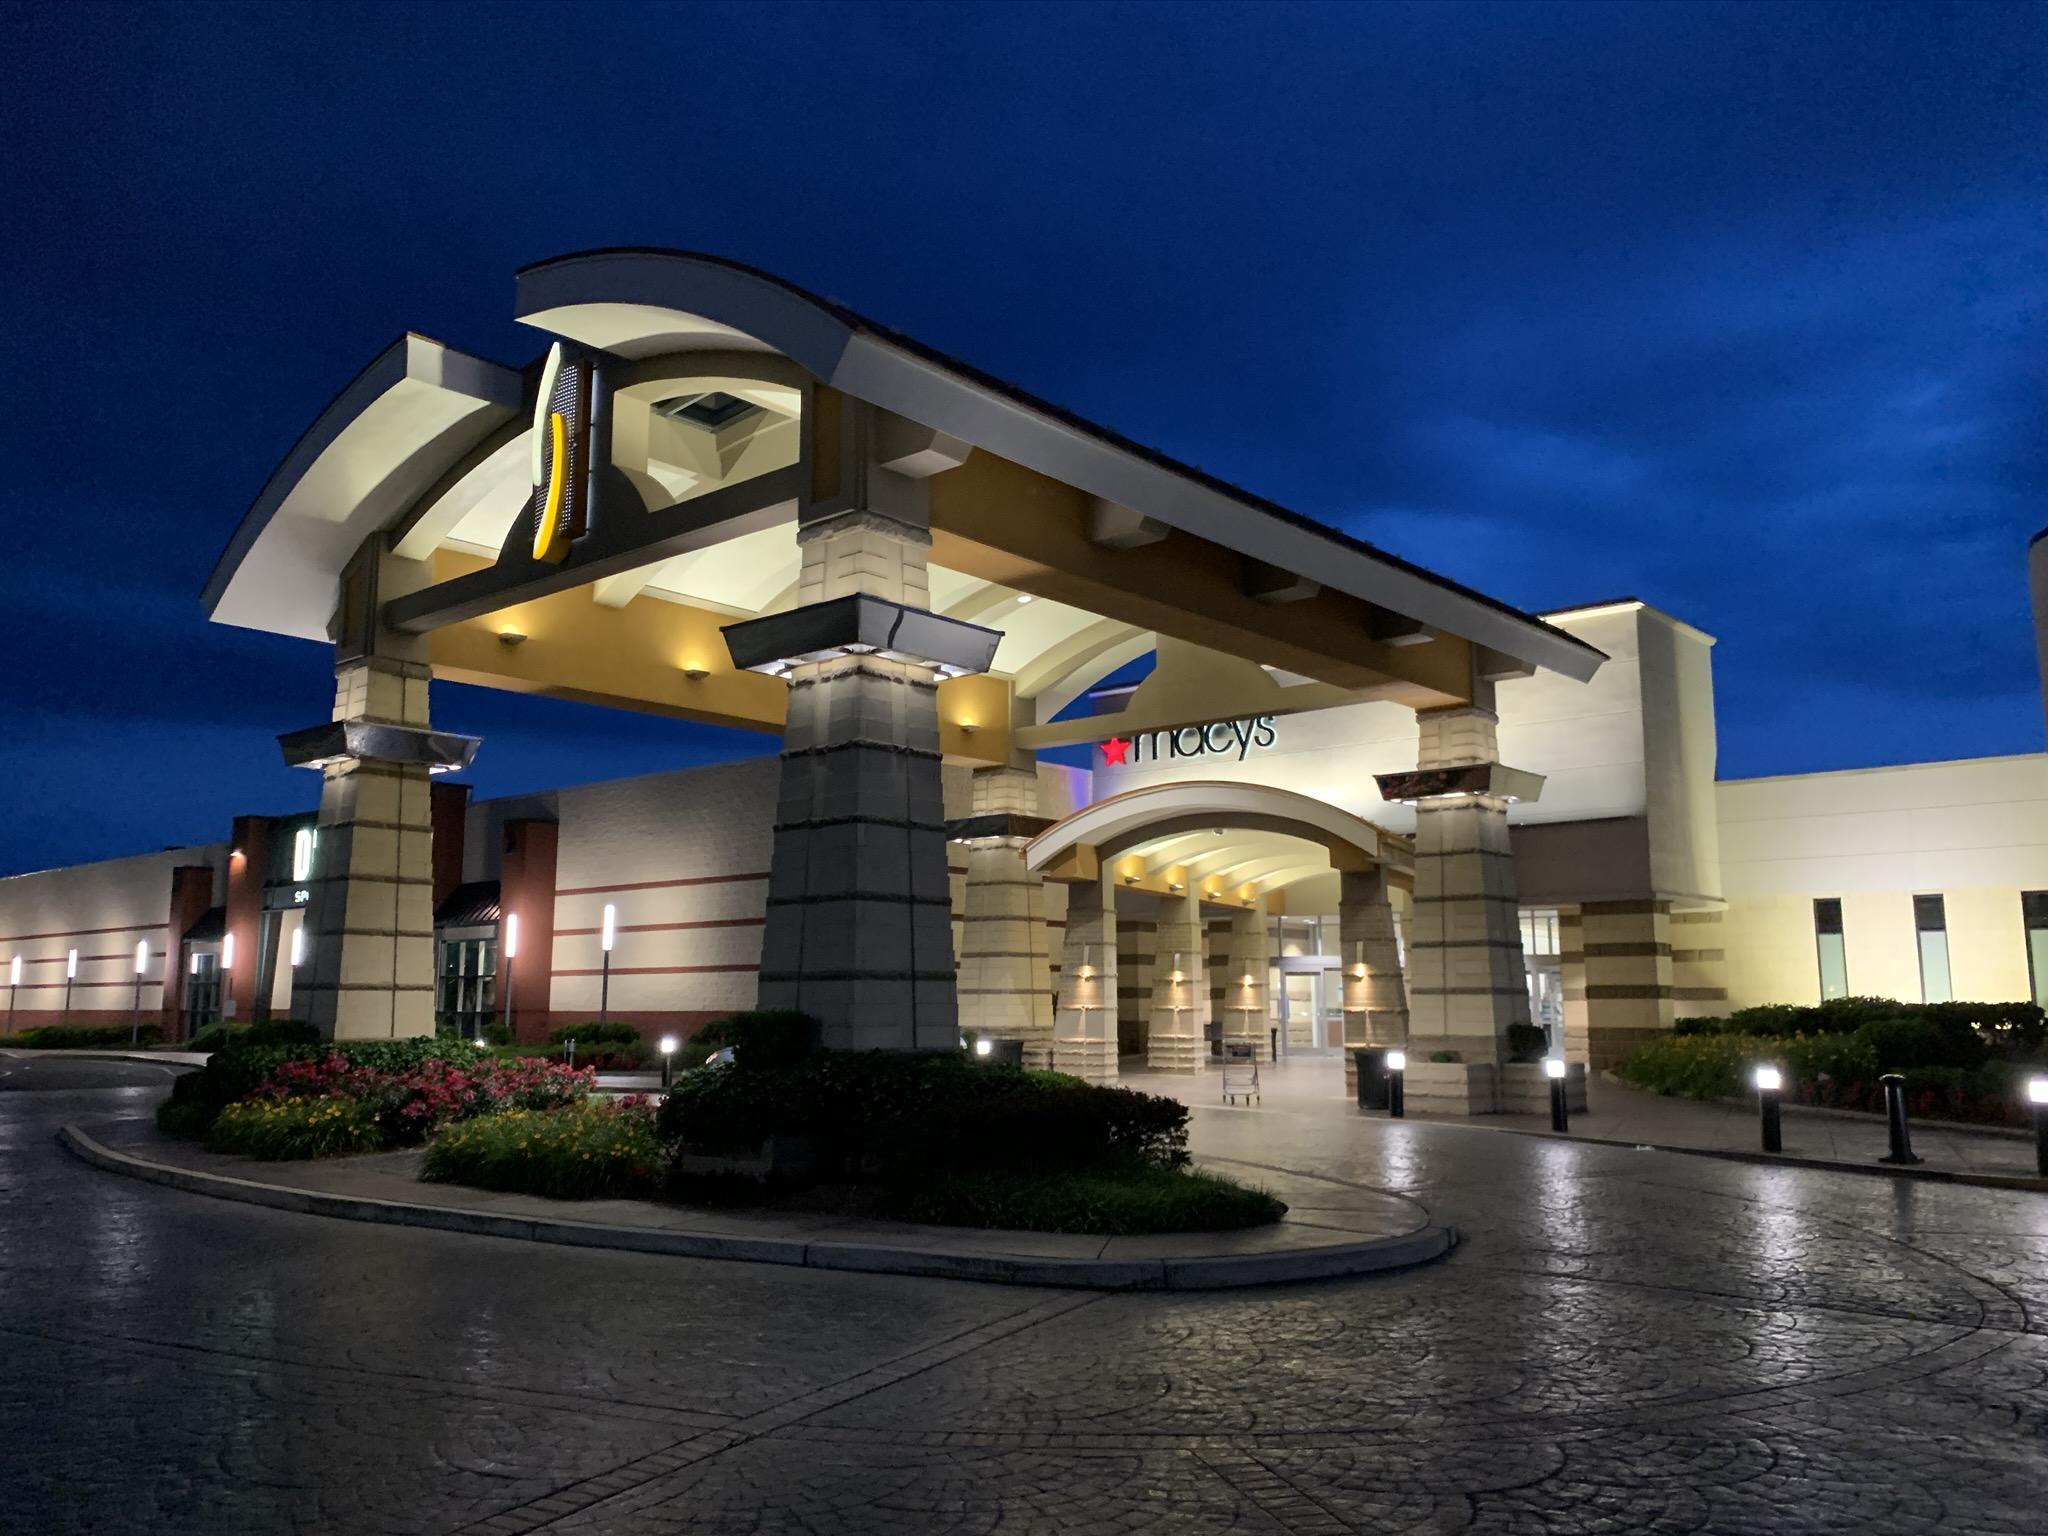 Bitcoin ATM inside Mall